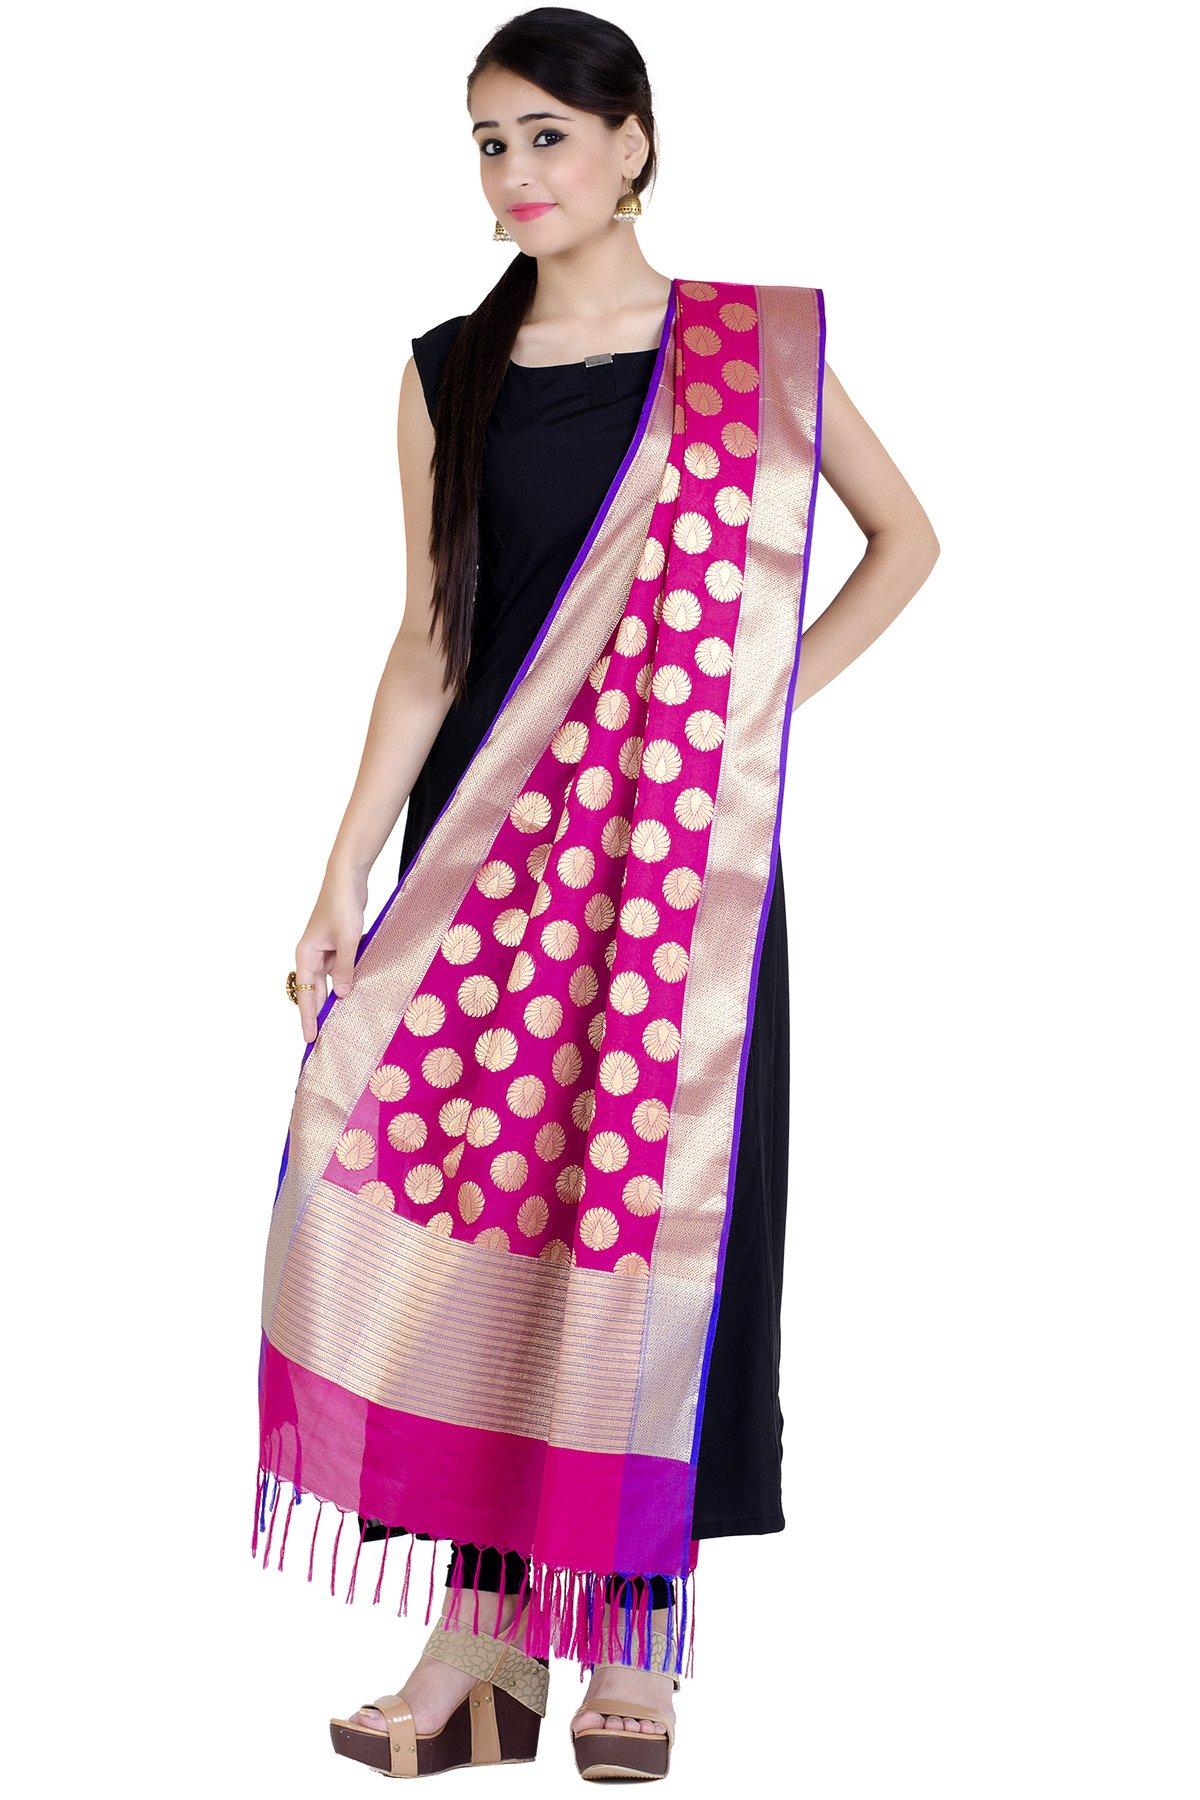 Chandrakala Women's Kataan Silk Blend Cutwork Brocade Banarasi Dupatta (Magenta) by Chandrakala (Image #2)